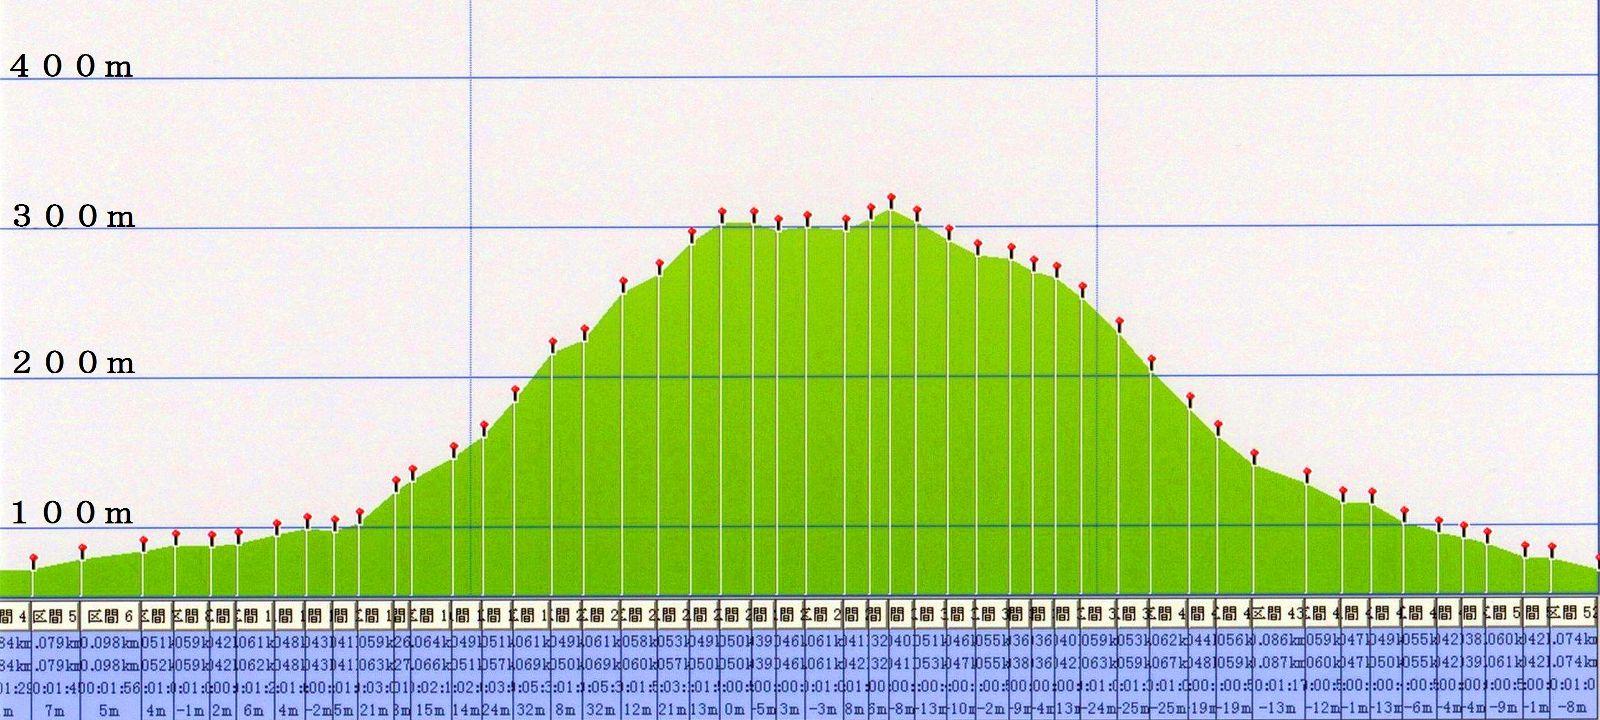 六甲全山縦走コースの高取山断面図